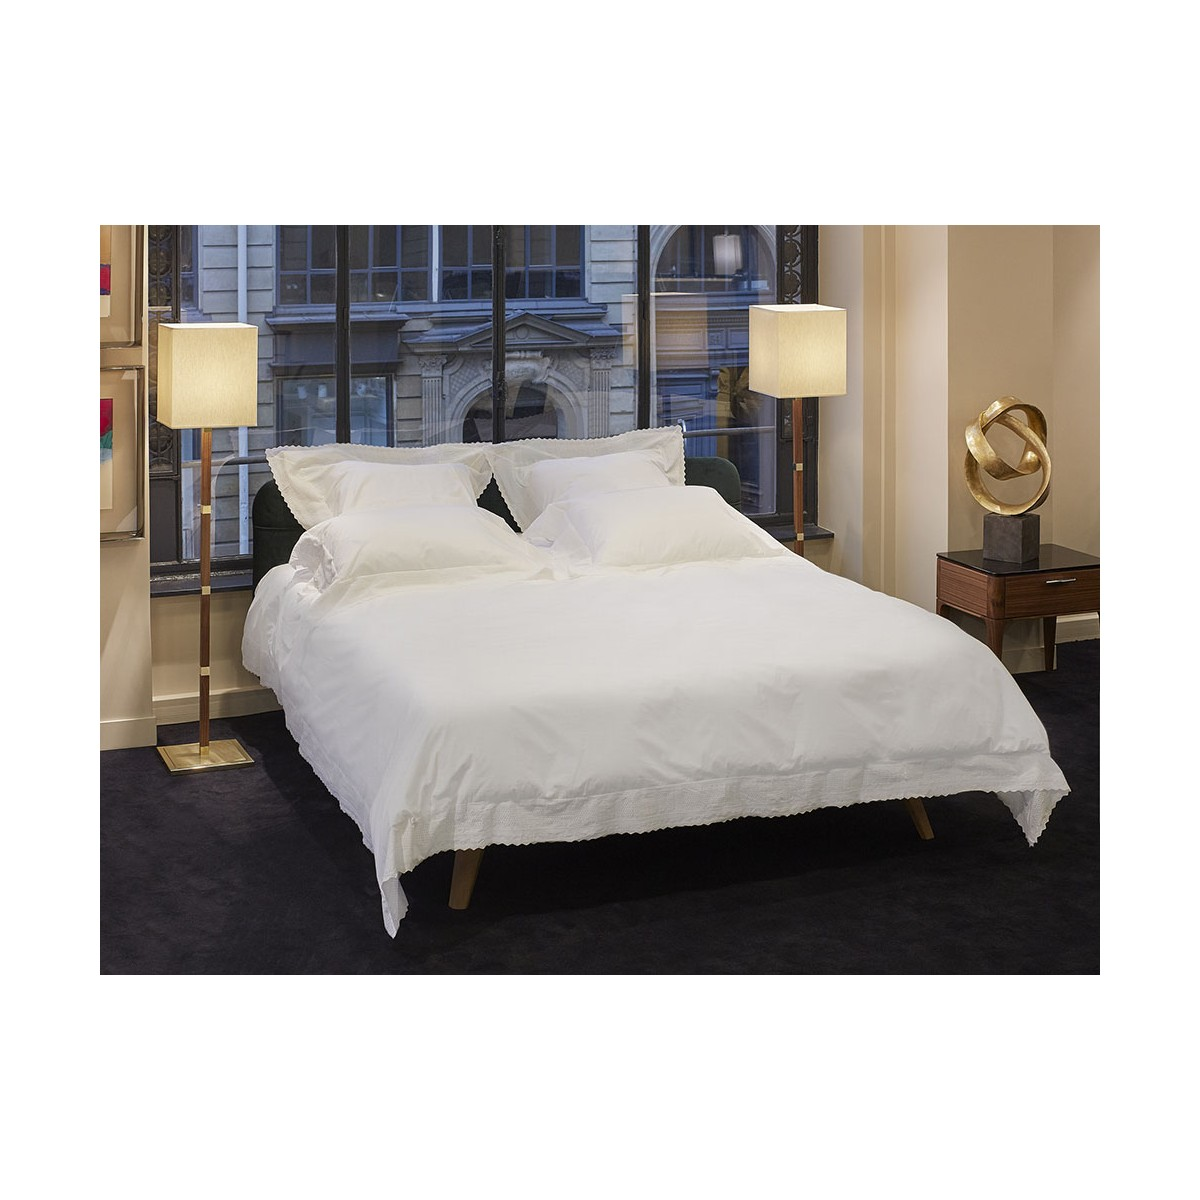 oreiller memoire de forme oreiller mmoire de forme. Black Bedroom Furniture Sets. Home Design Ideas